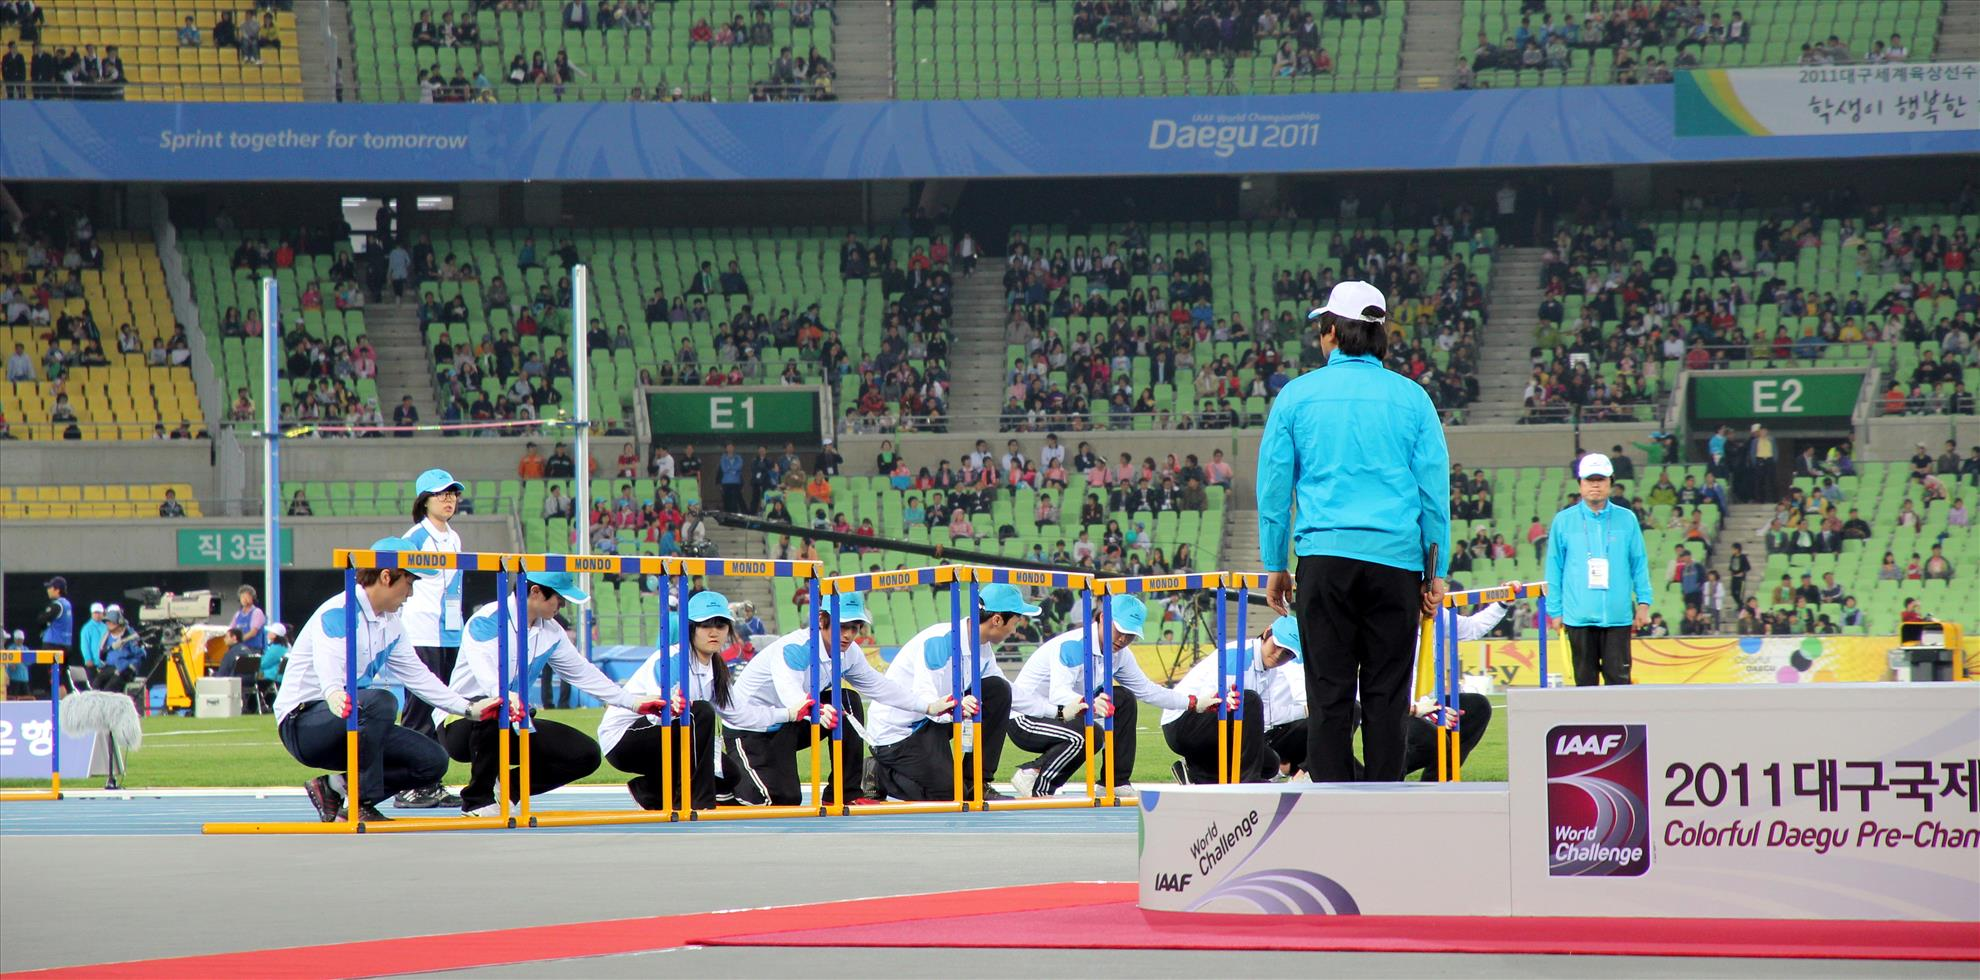 Daegu MM 2011